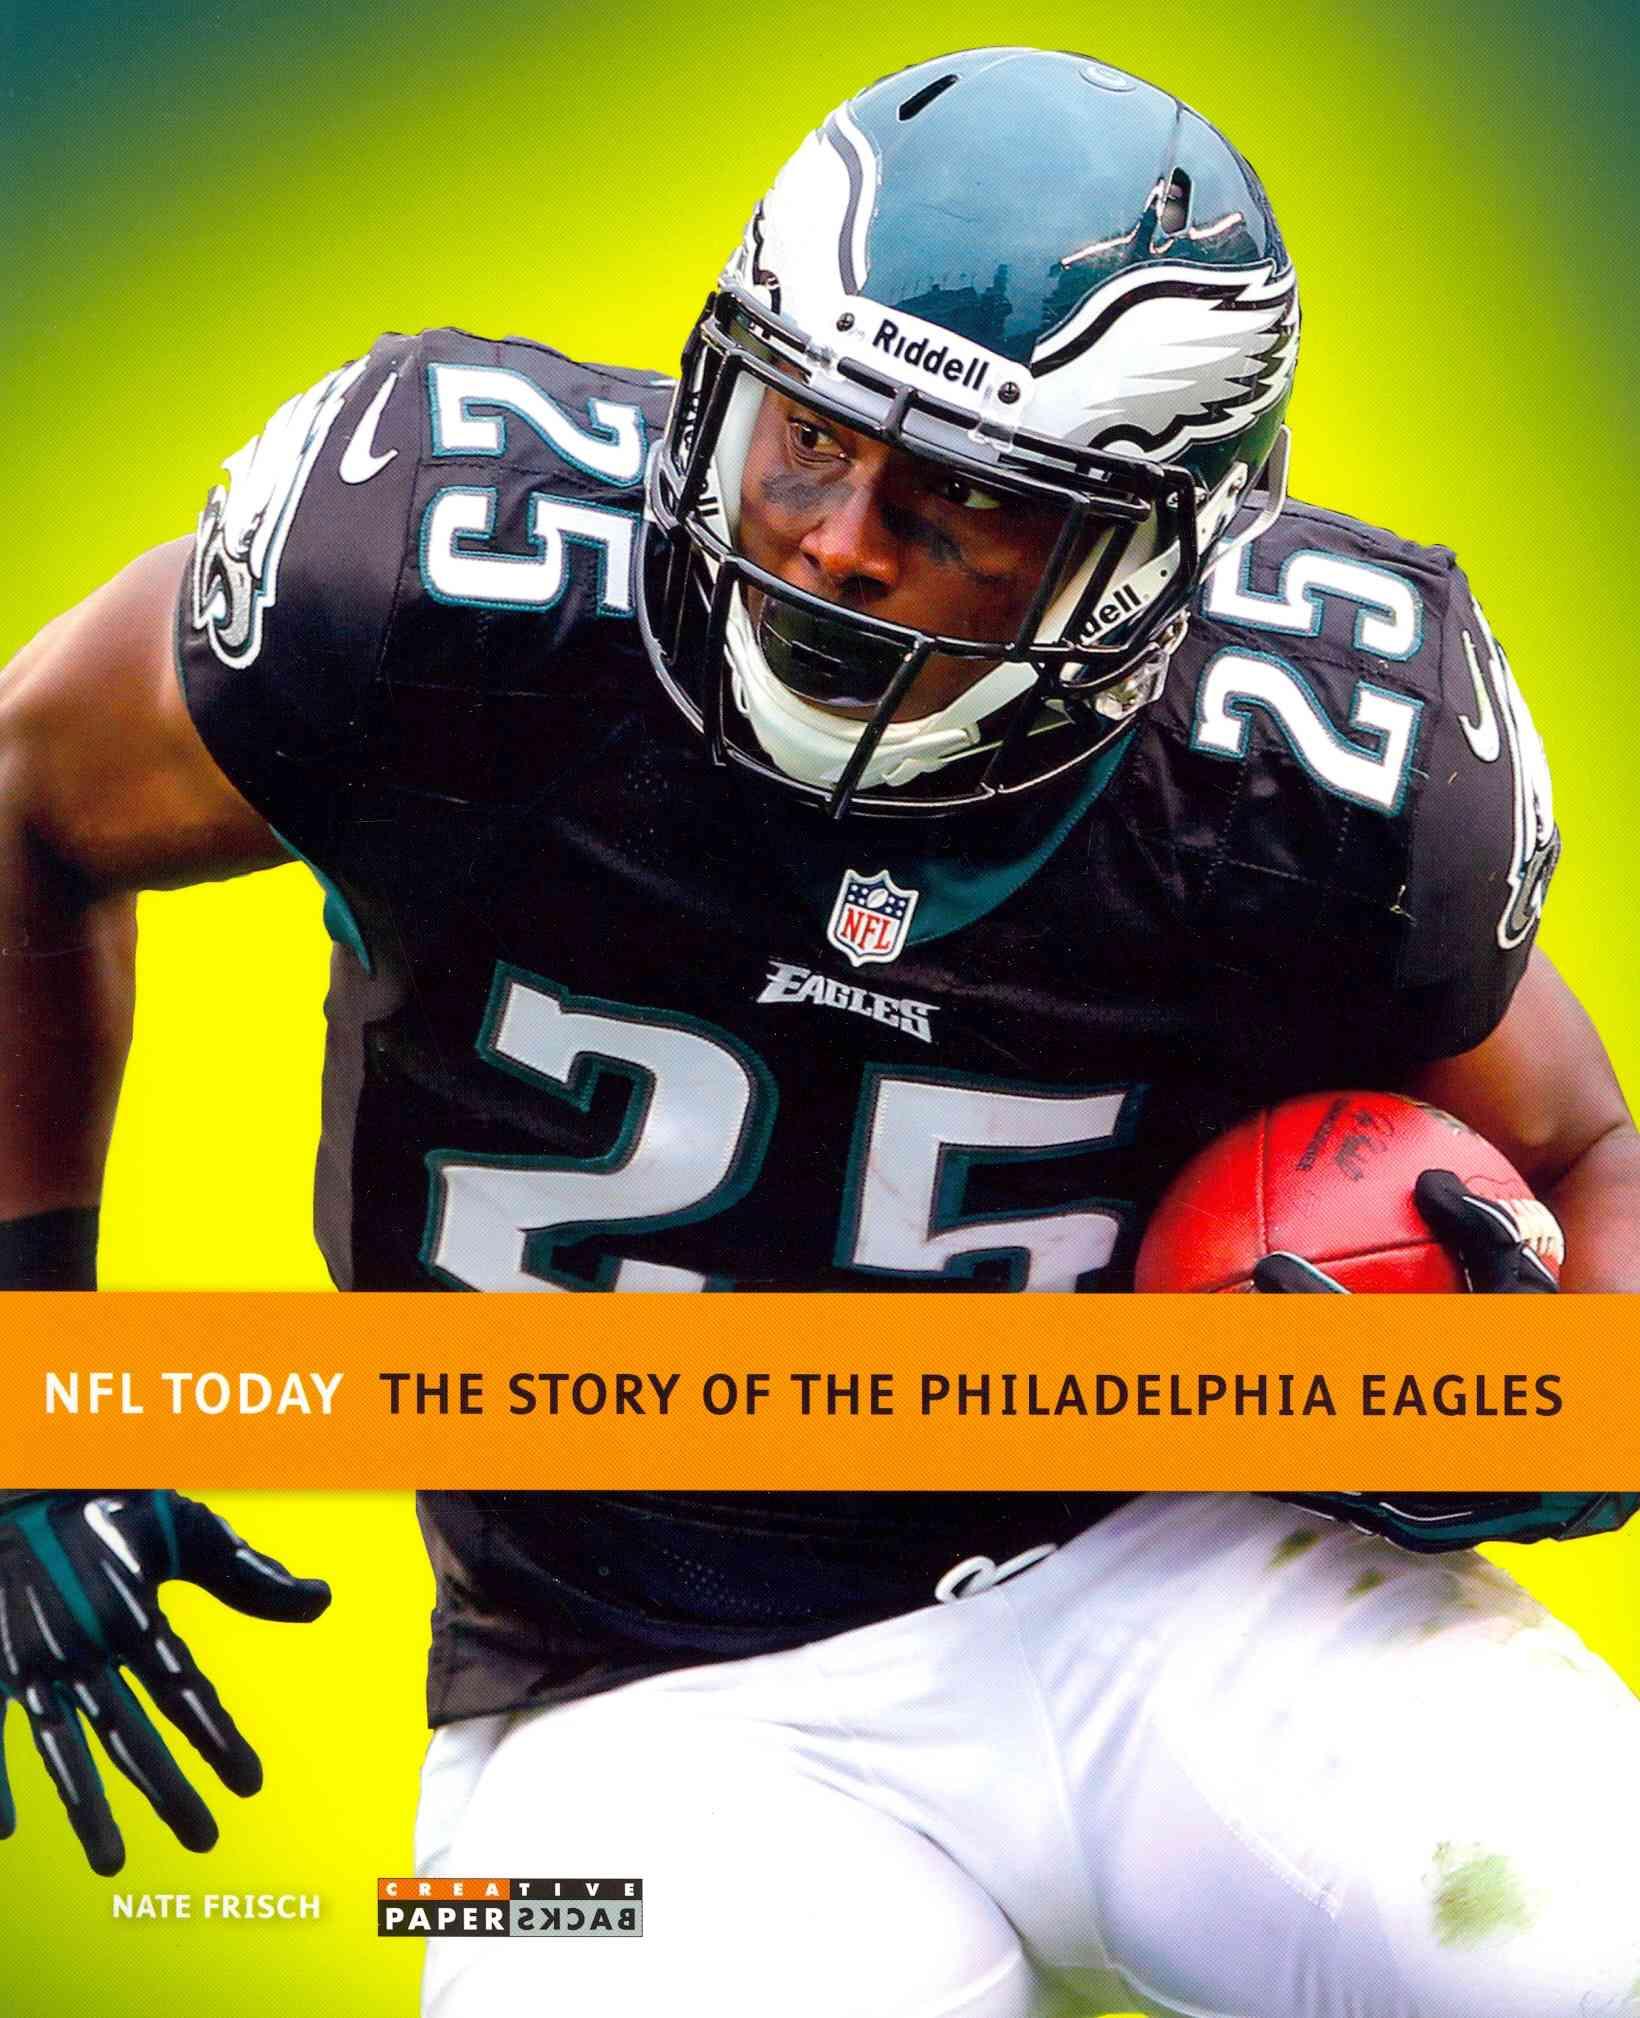 Philadelphia Eagles By Frisch, Nate